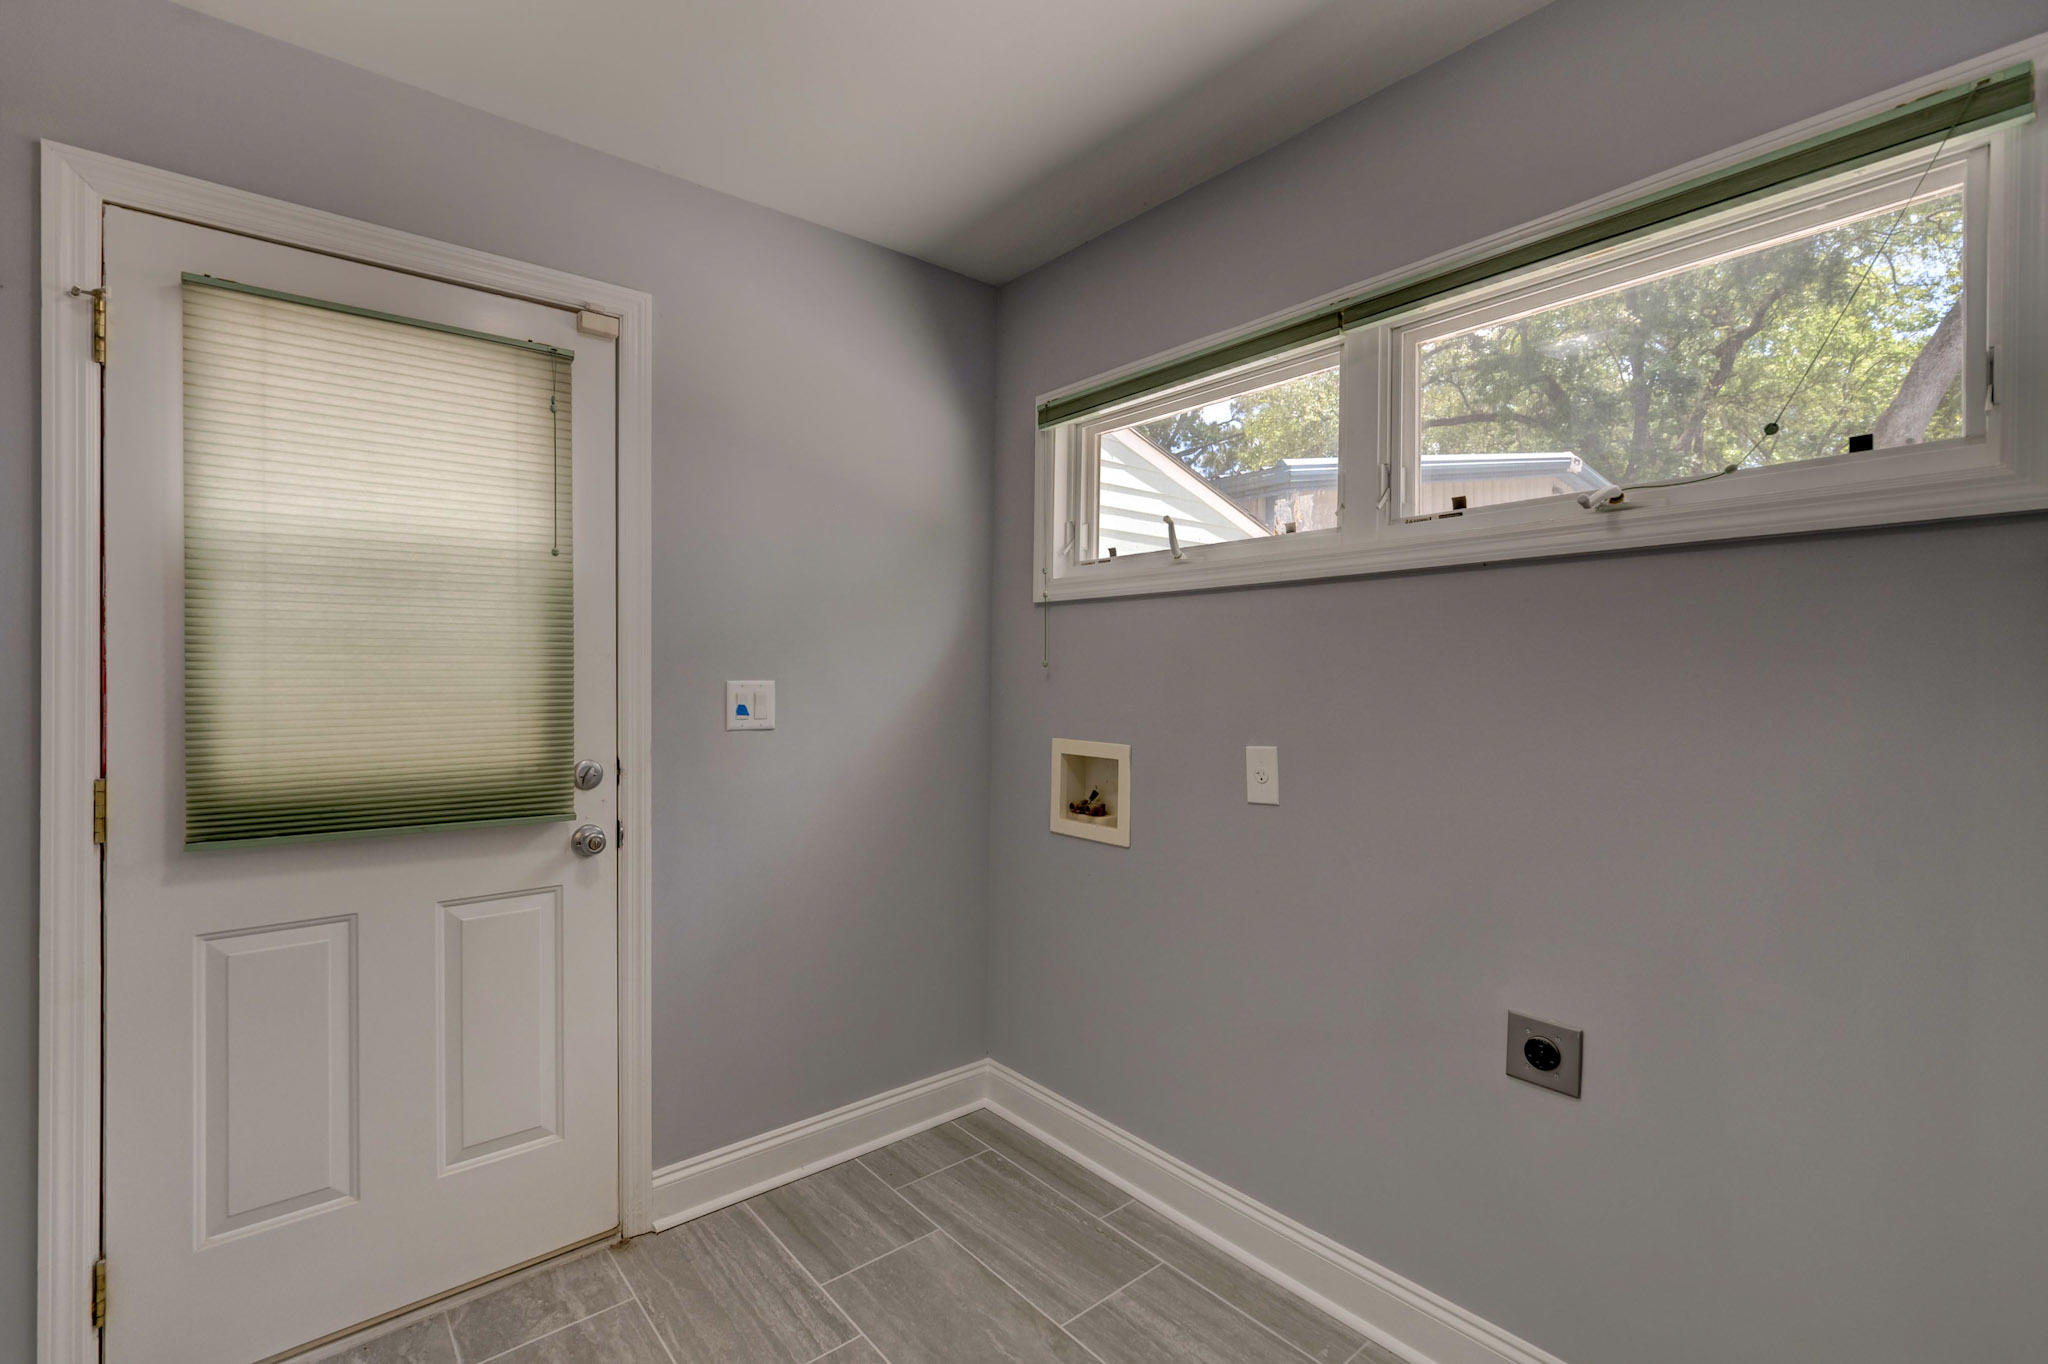 Covington Hills Homes For Sale - 5886 Ryans Bluff, North Charleston, SC - 26